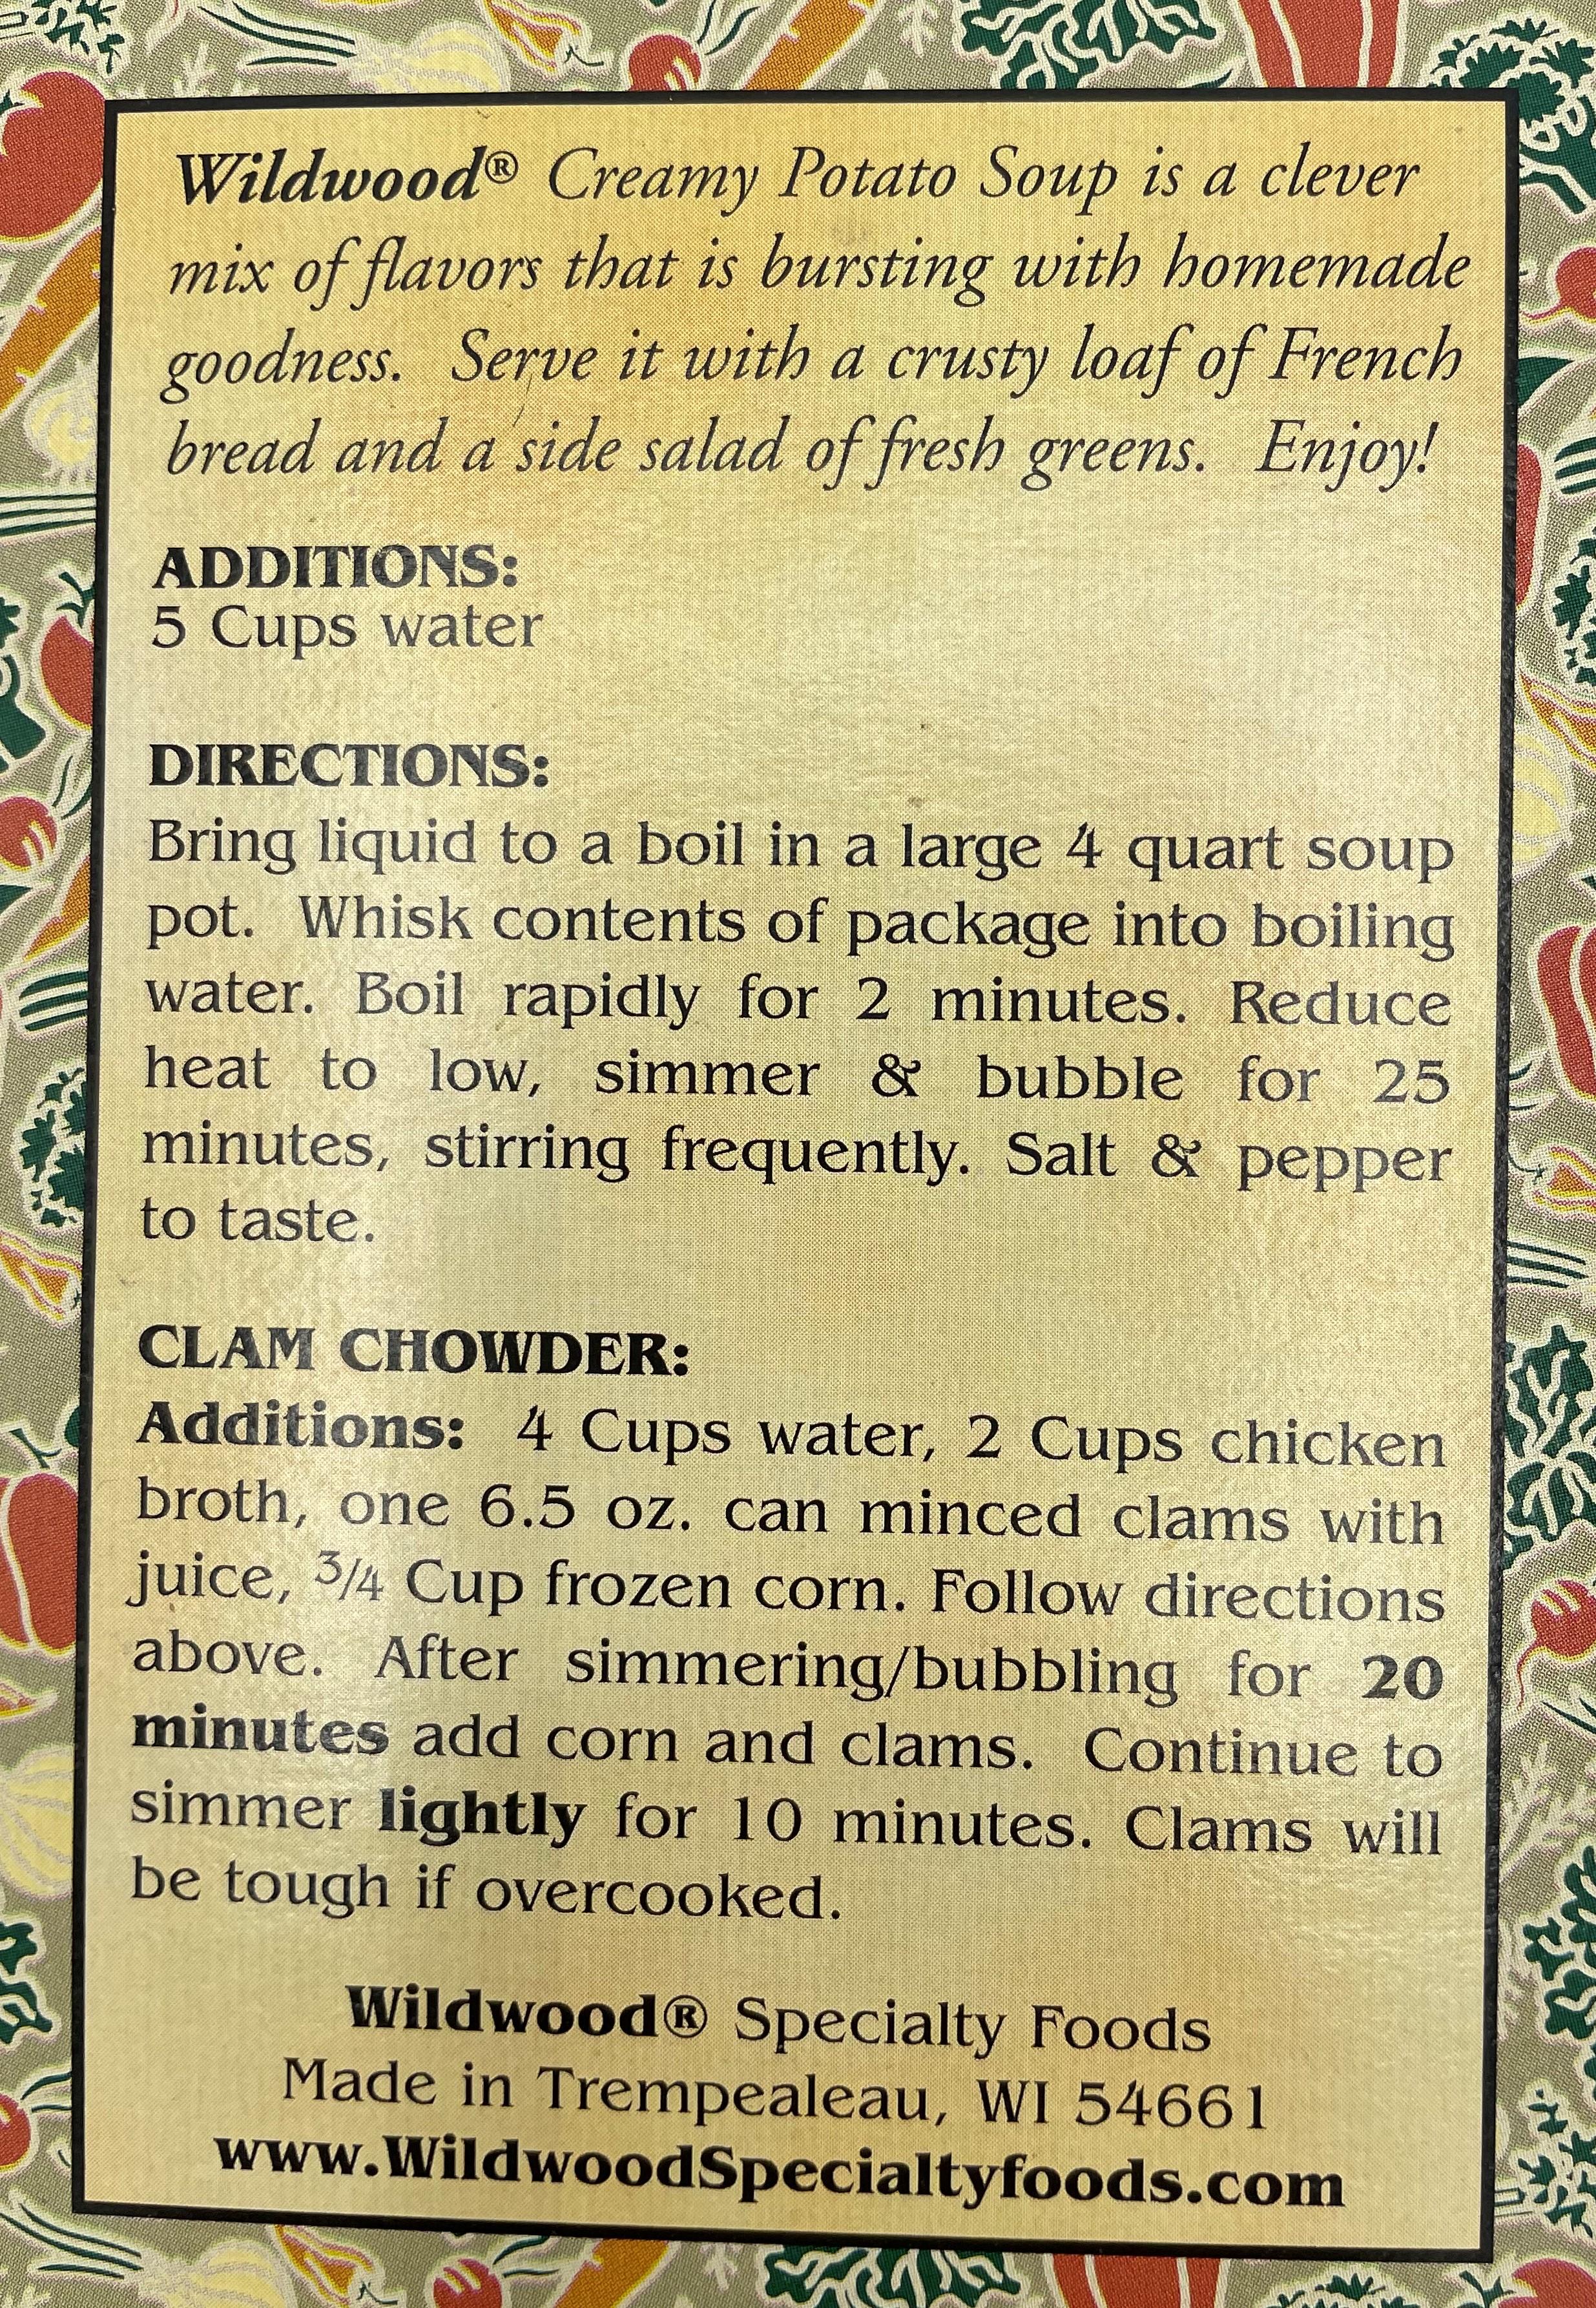 Wildwood Creamy Potato Soup